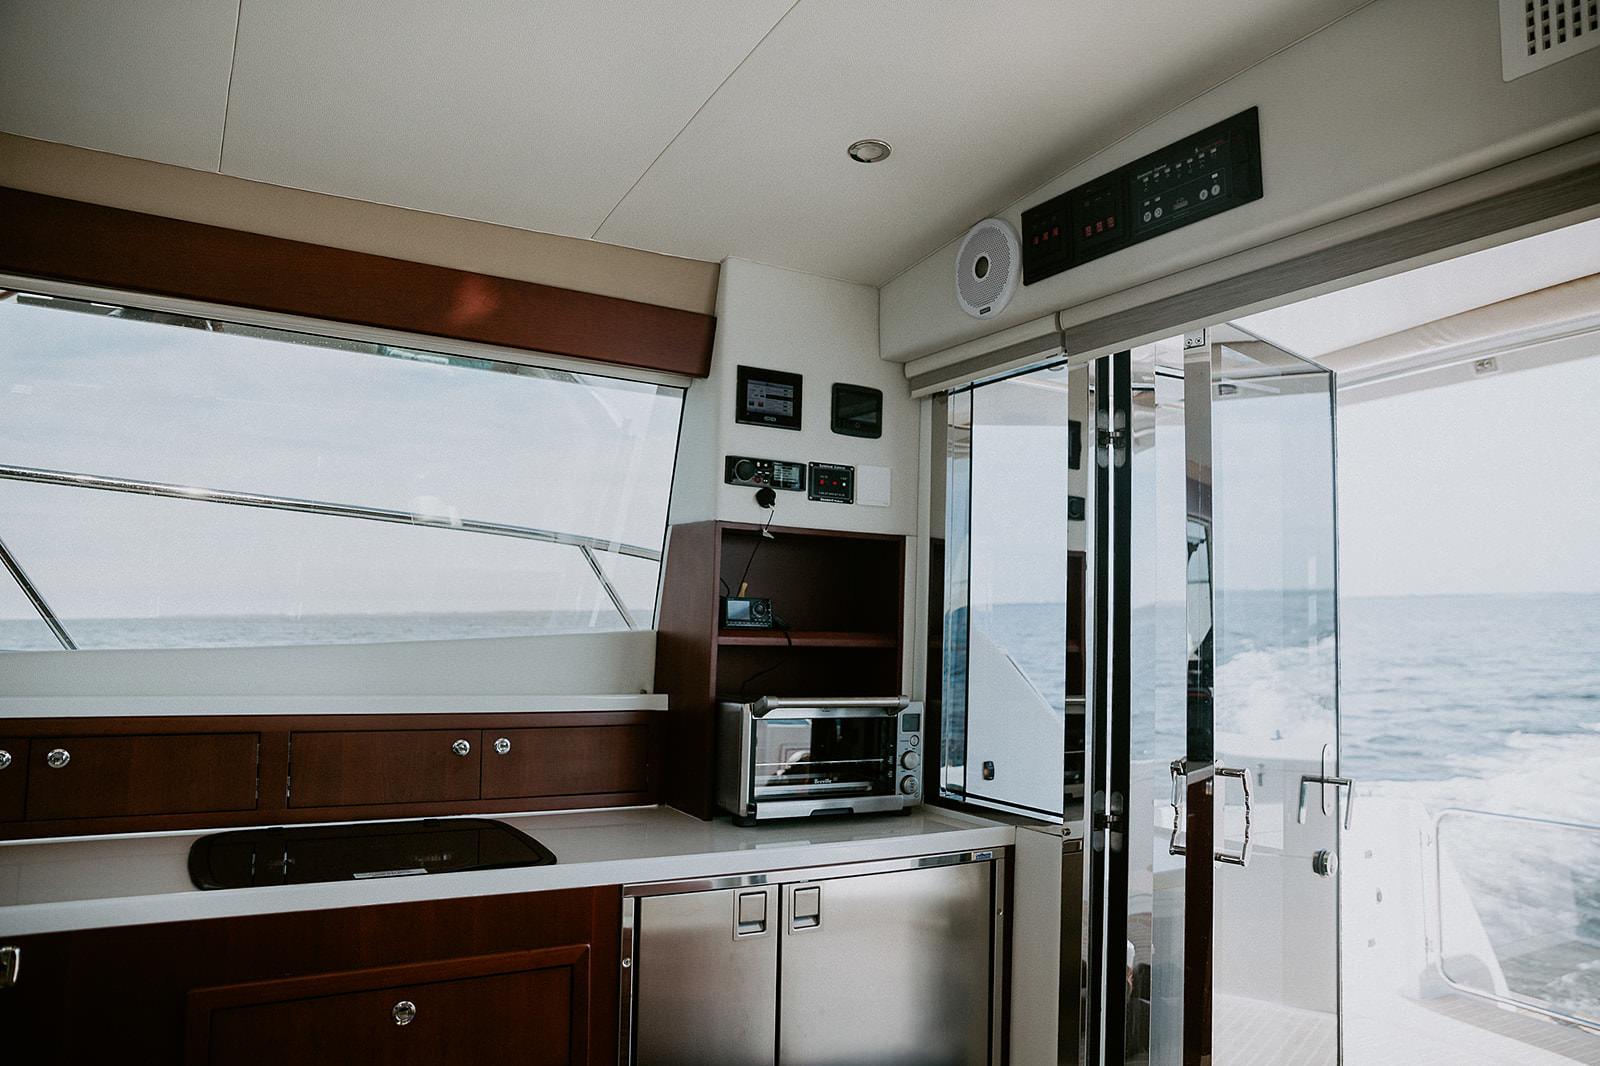 ArrowCat Power Catamarans displaying galley countertops and refrigerator